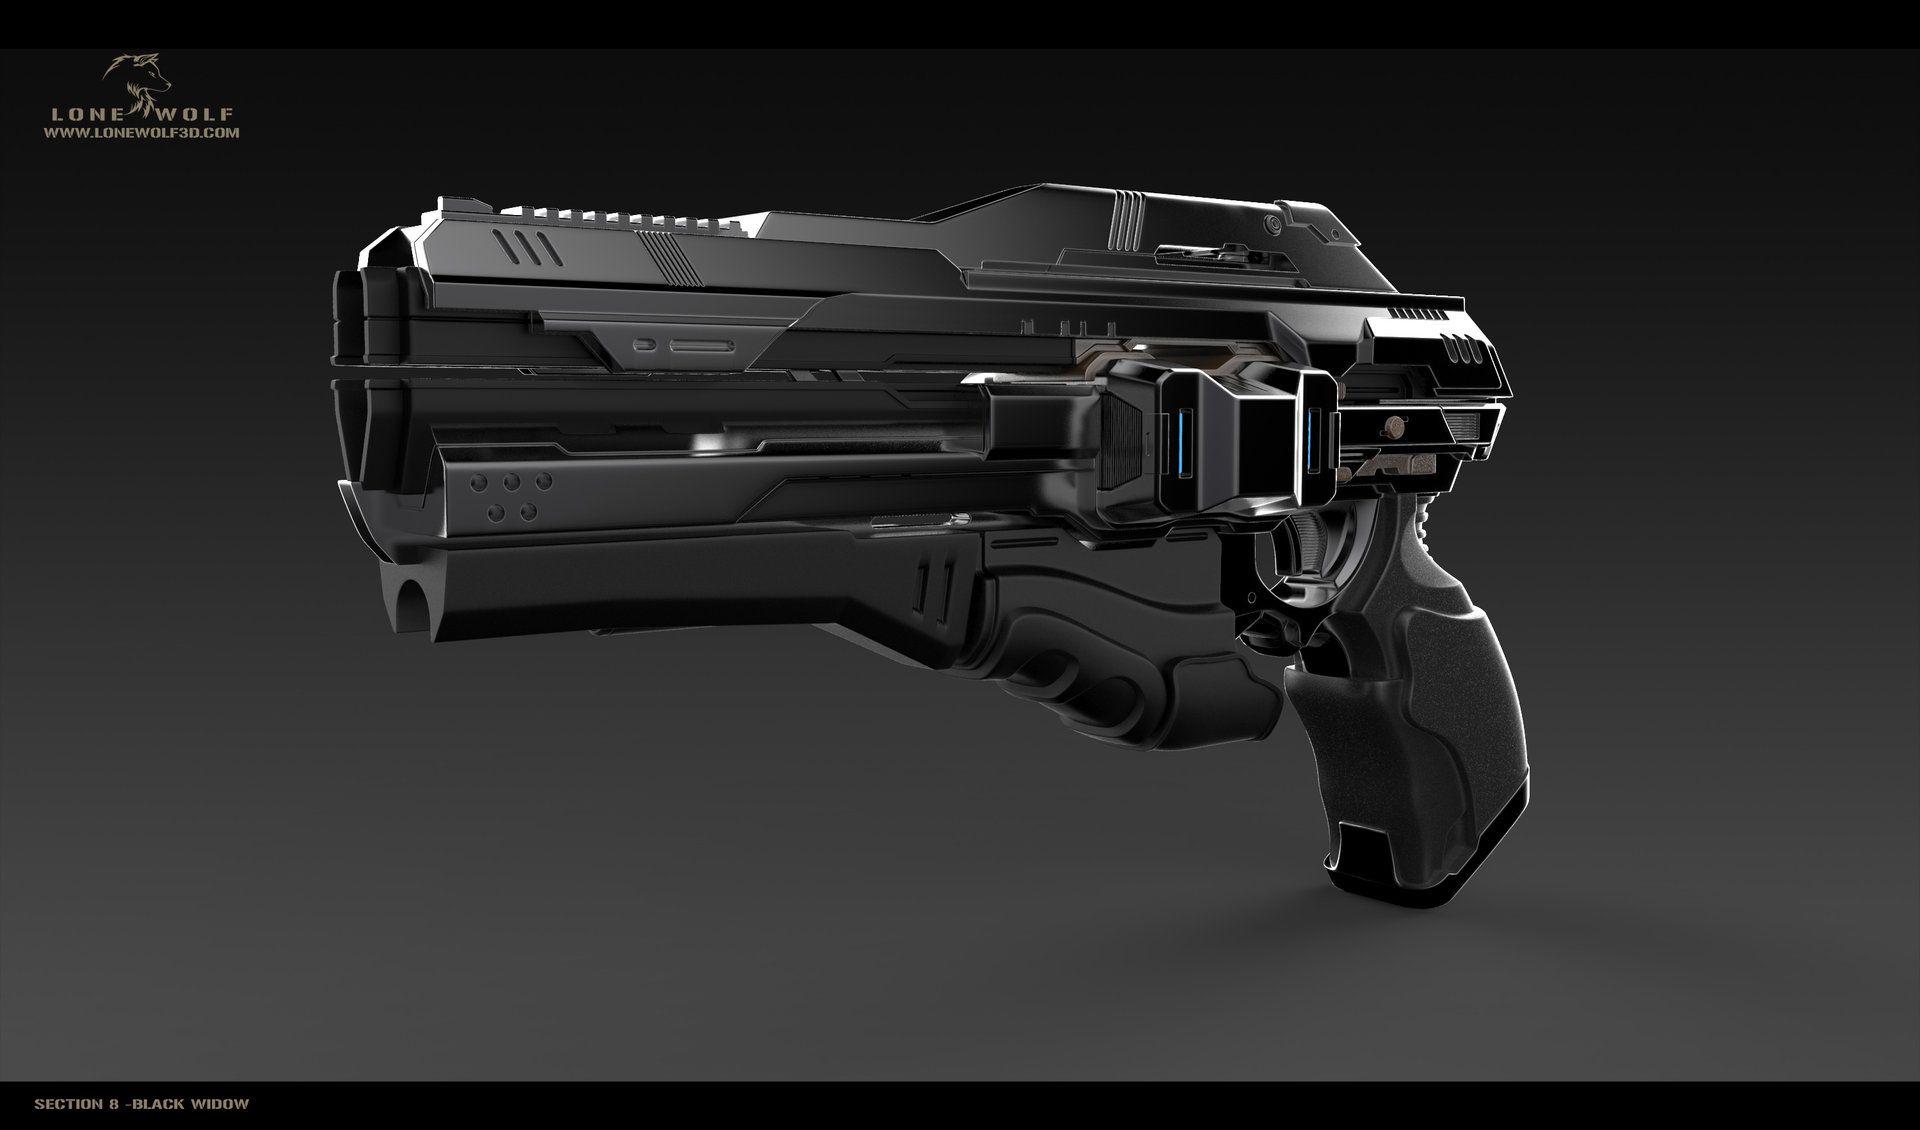 Pin on Gun and Rifle